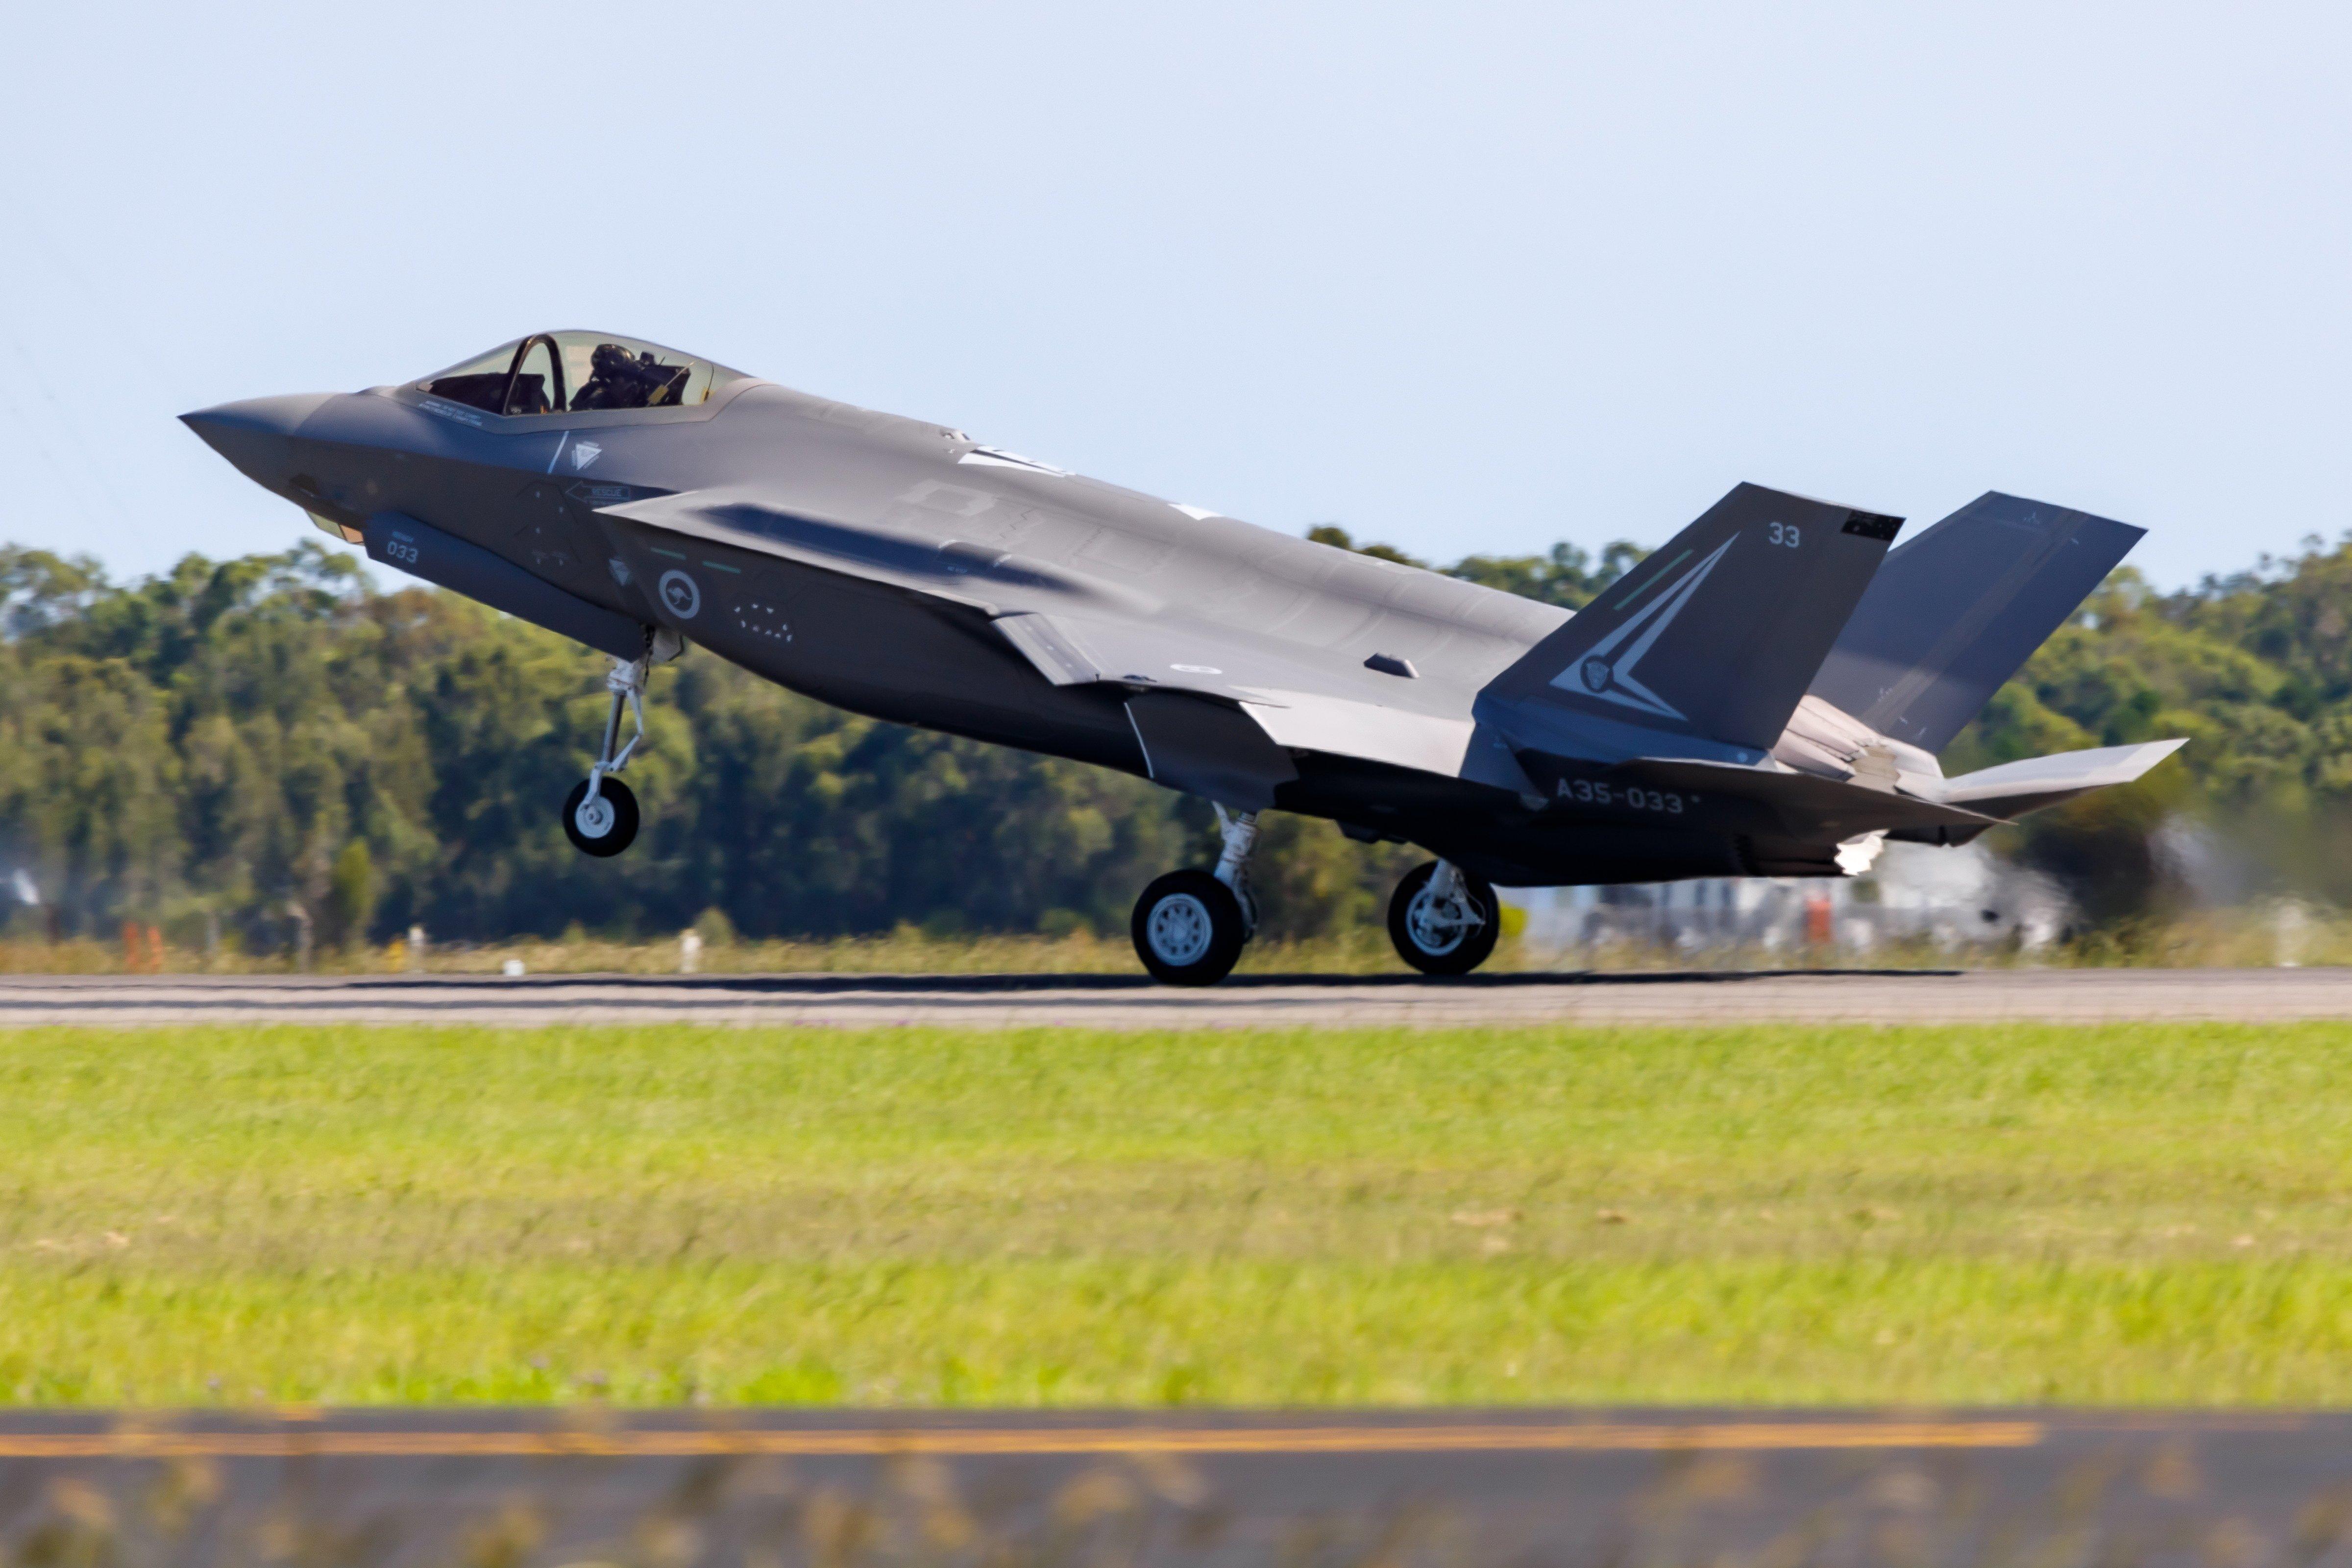 RAAF F-35A [Commonwealth of Australia - Department of Defence/Cpl Craig Barrett]